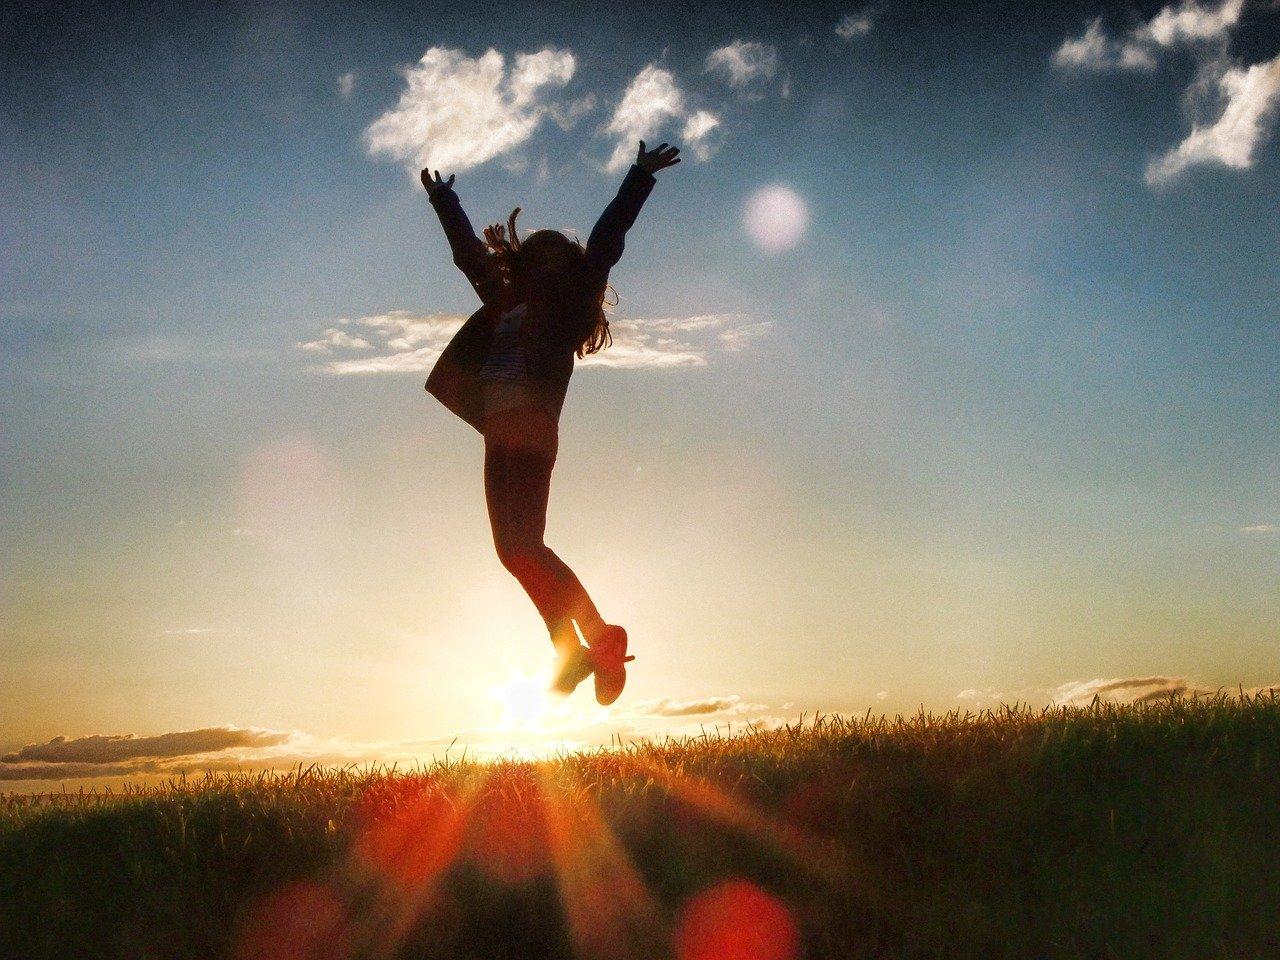 Kako biti sretan? Usredotoči se na svoje snage, ne slabosti